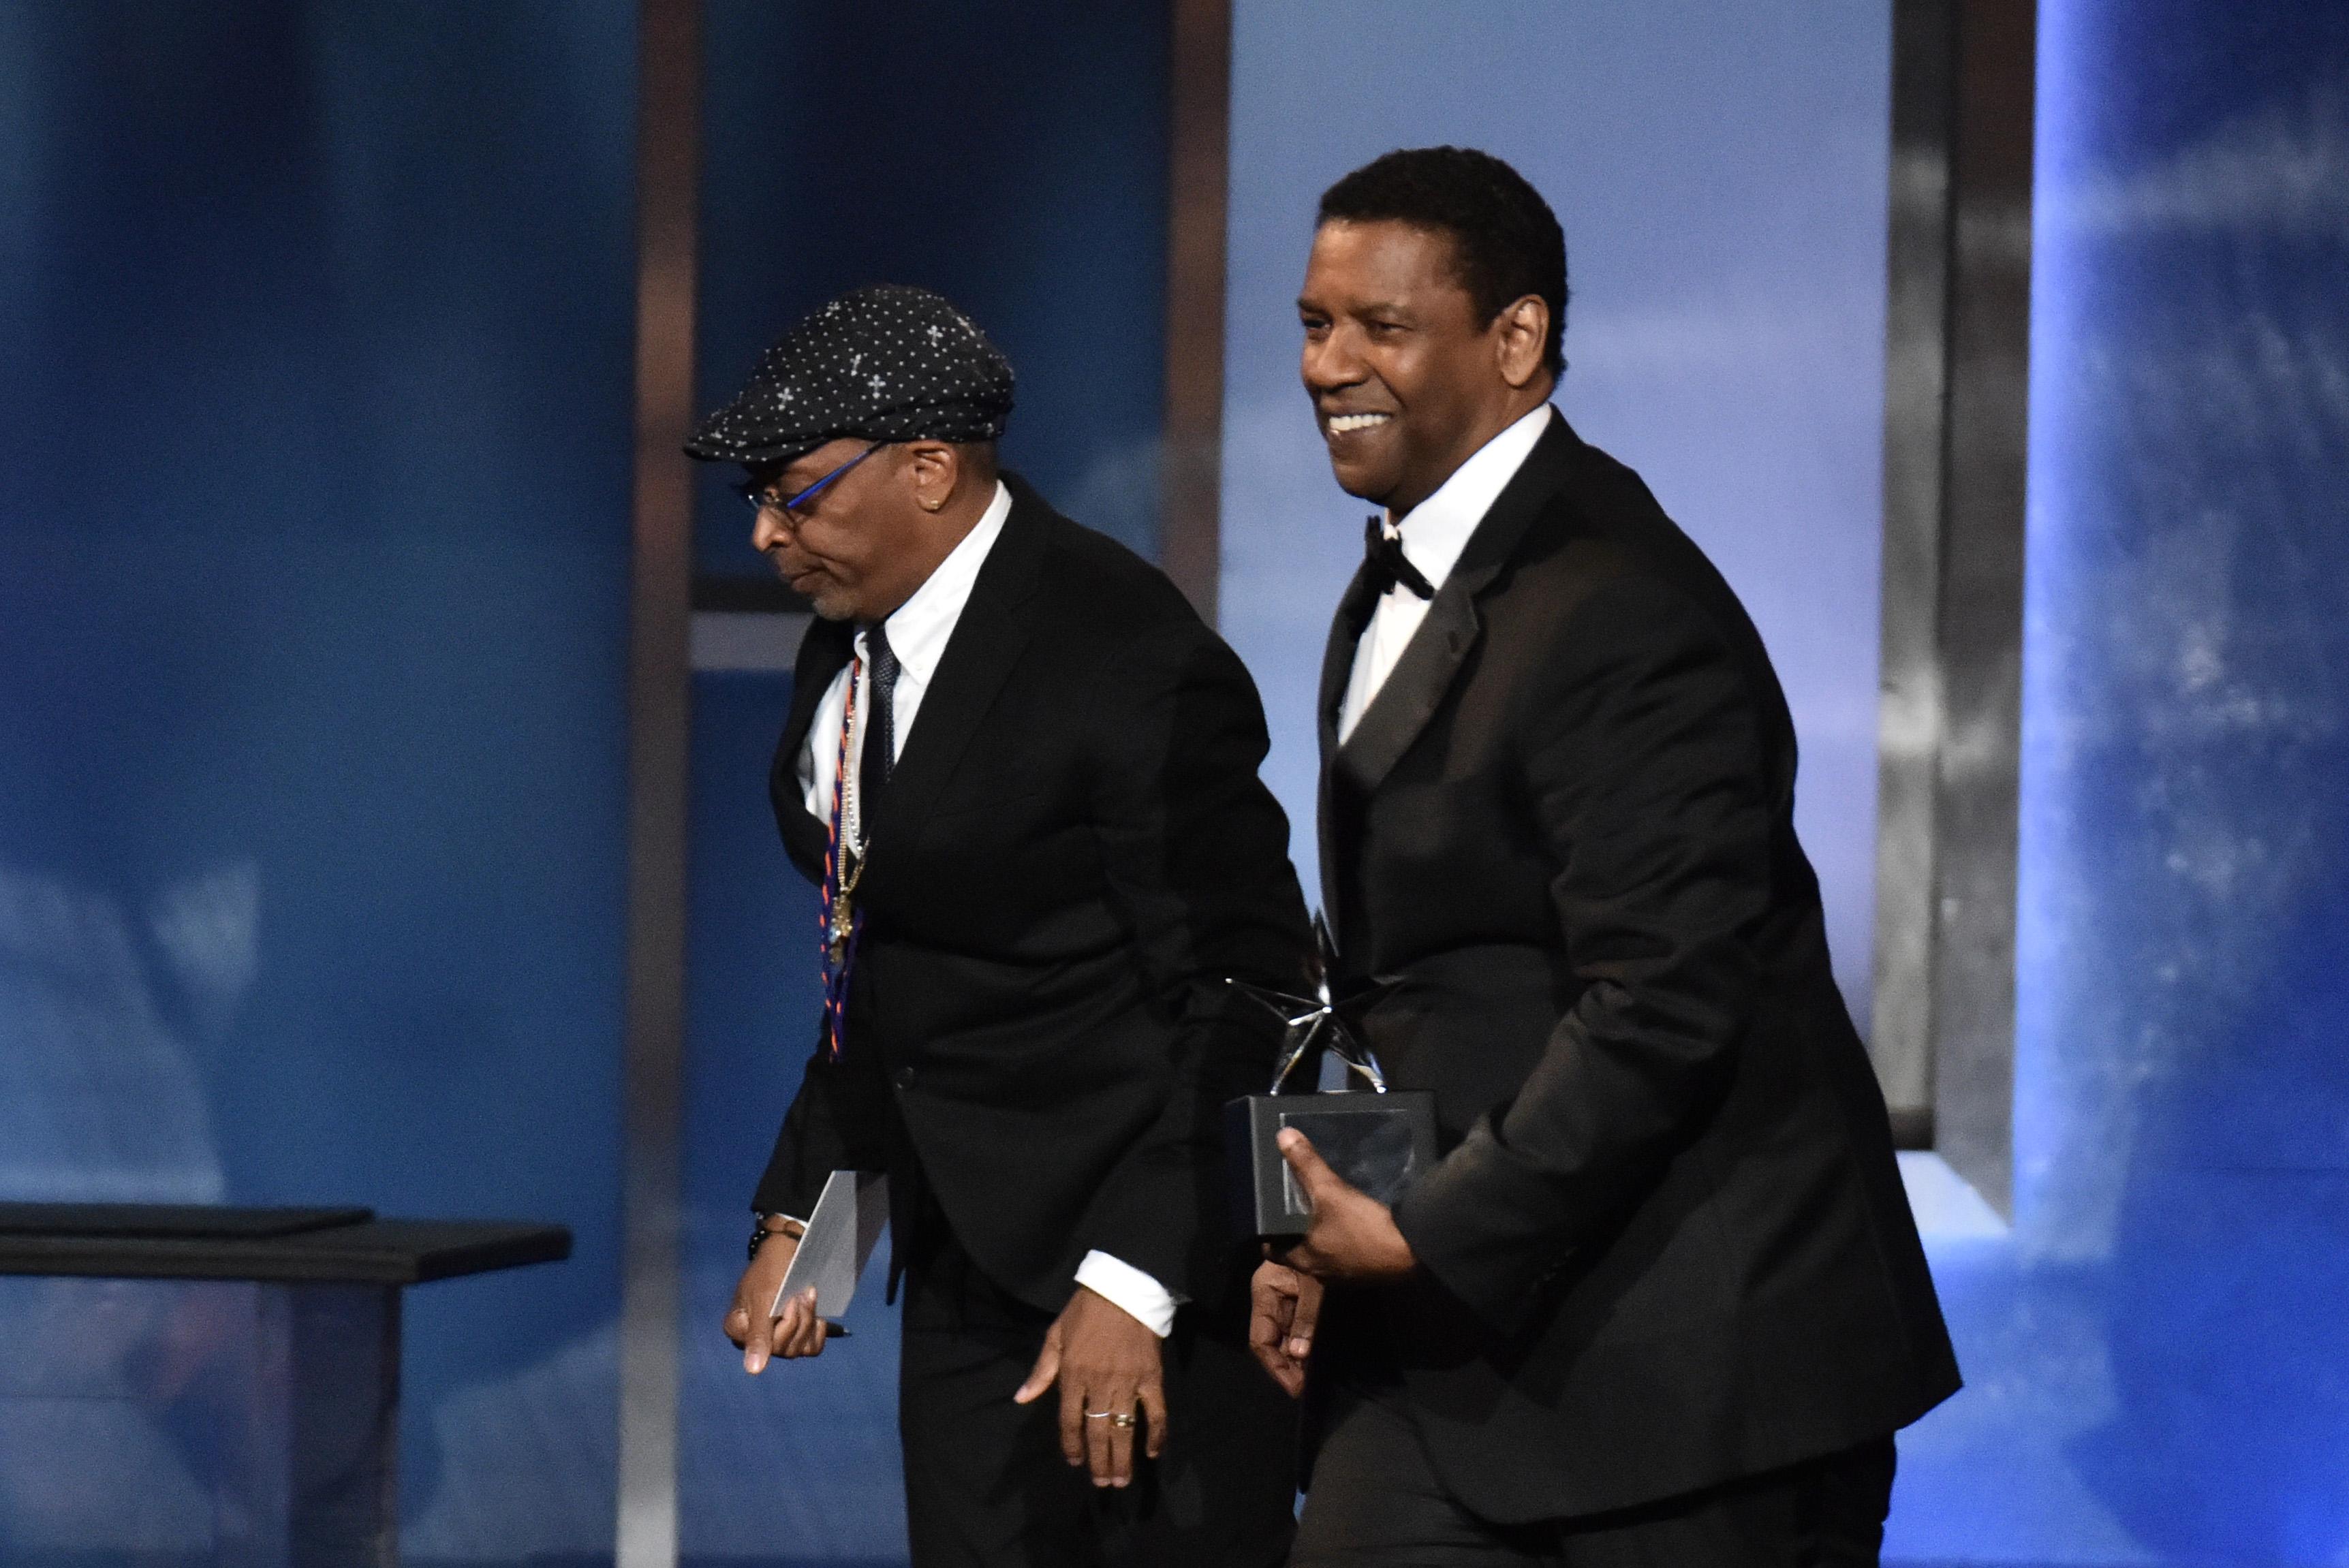 Spike Lee and Denzel WashingtonAFI Honors Denzel Washington, Show, Dolby Theatre, Los Angeles, USA - 06 Jun 2019